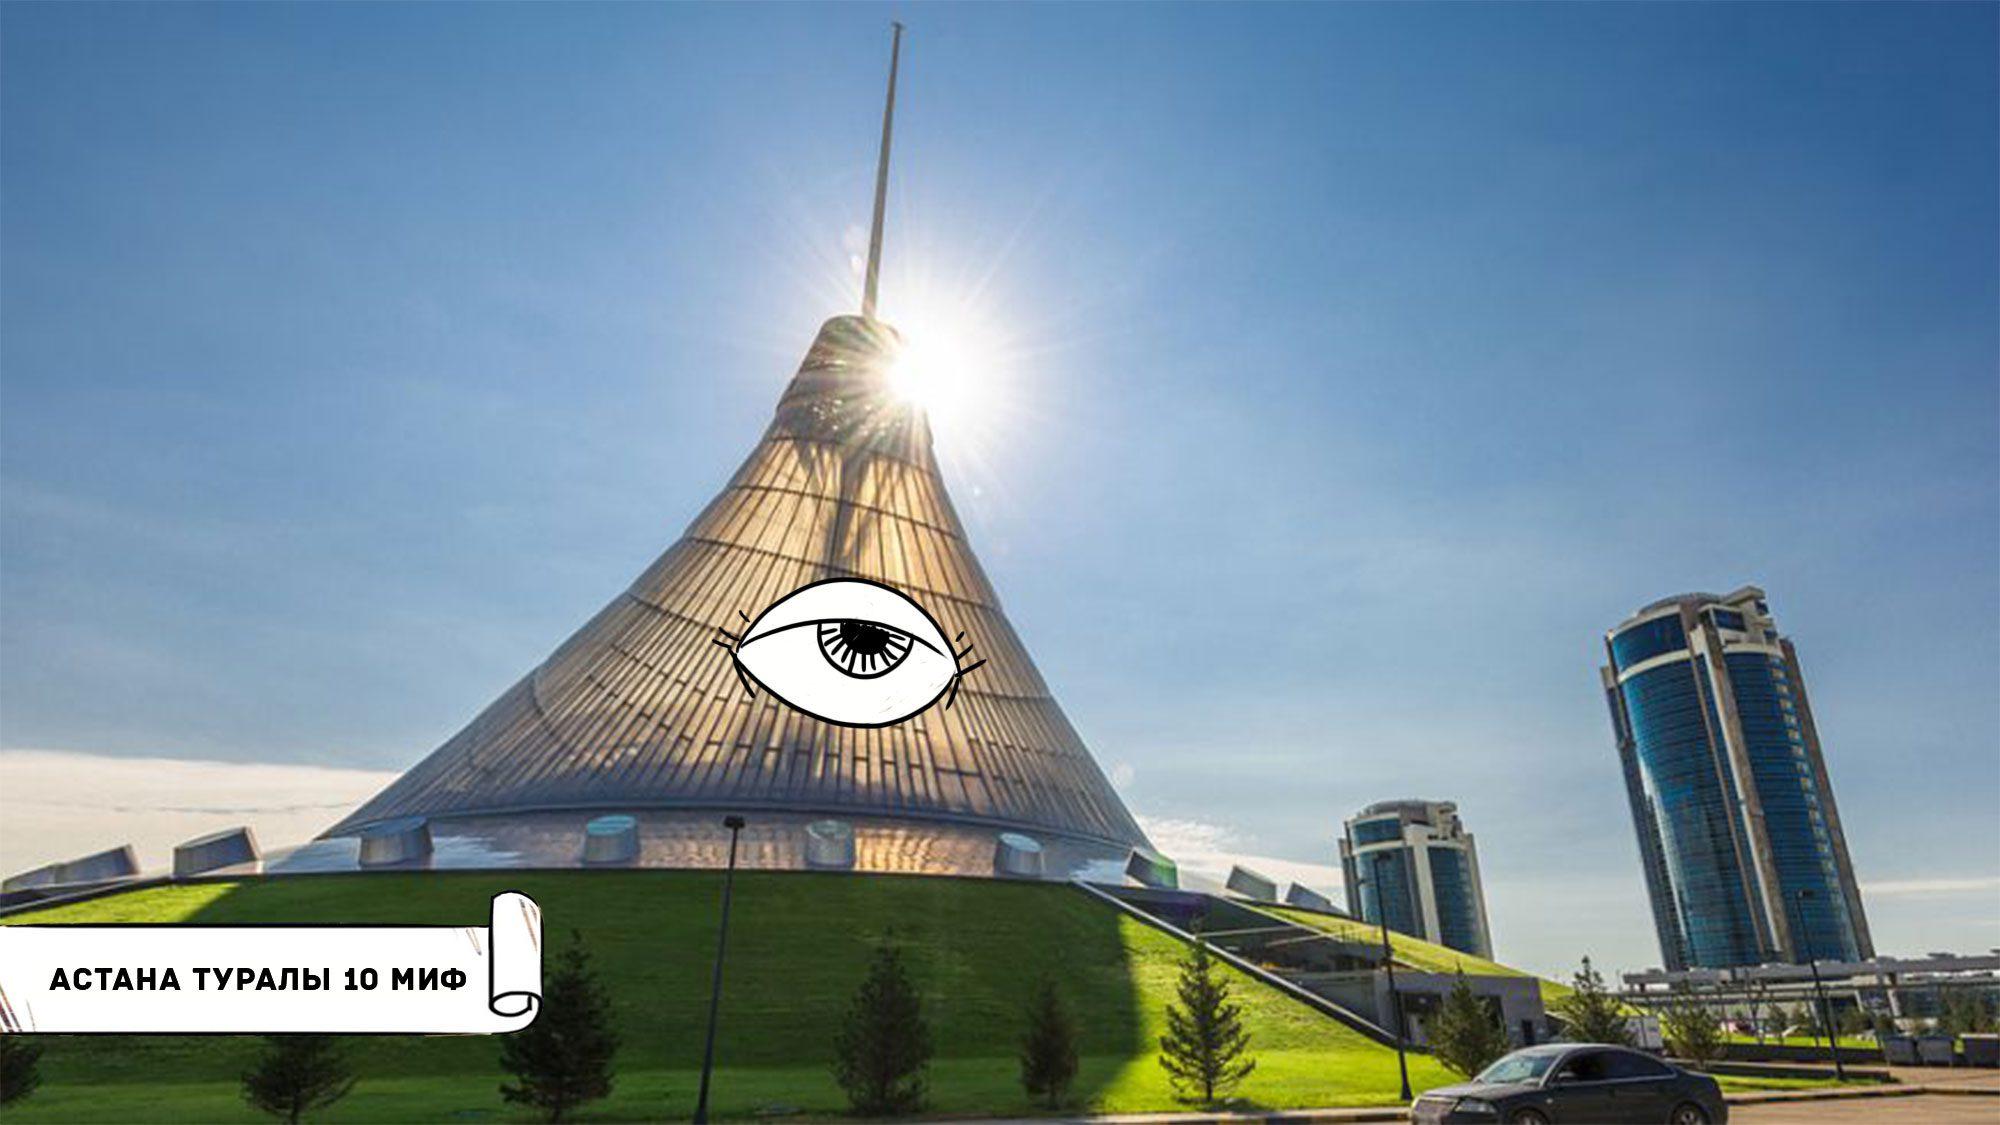 Астананы Масондар салып жатыр